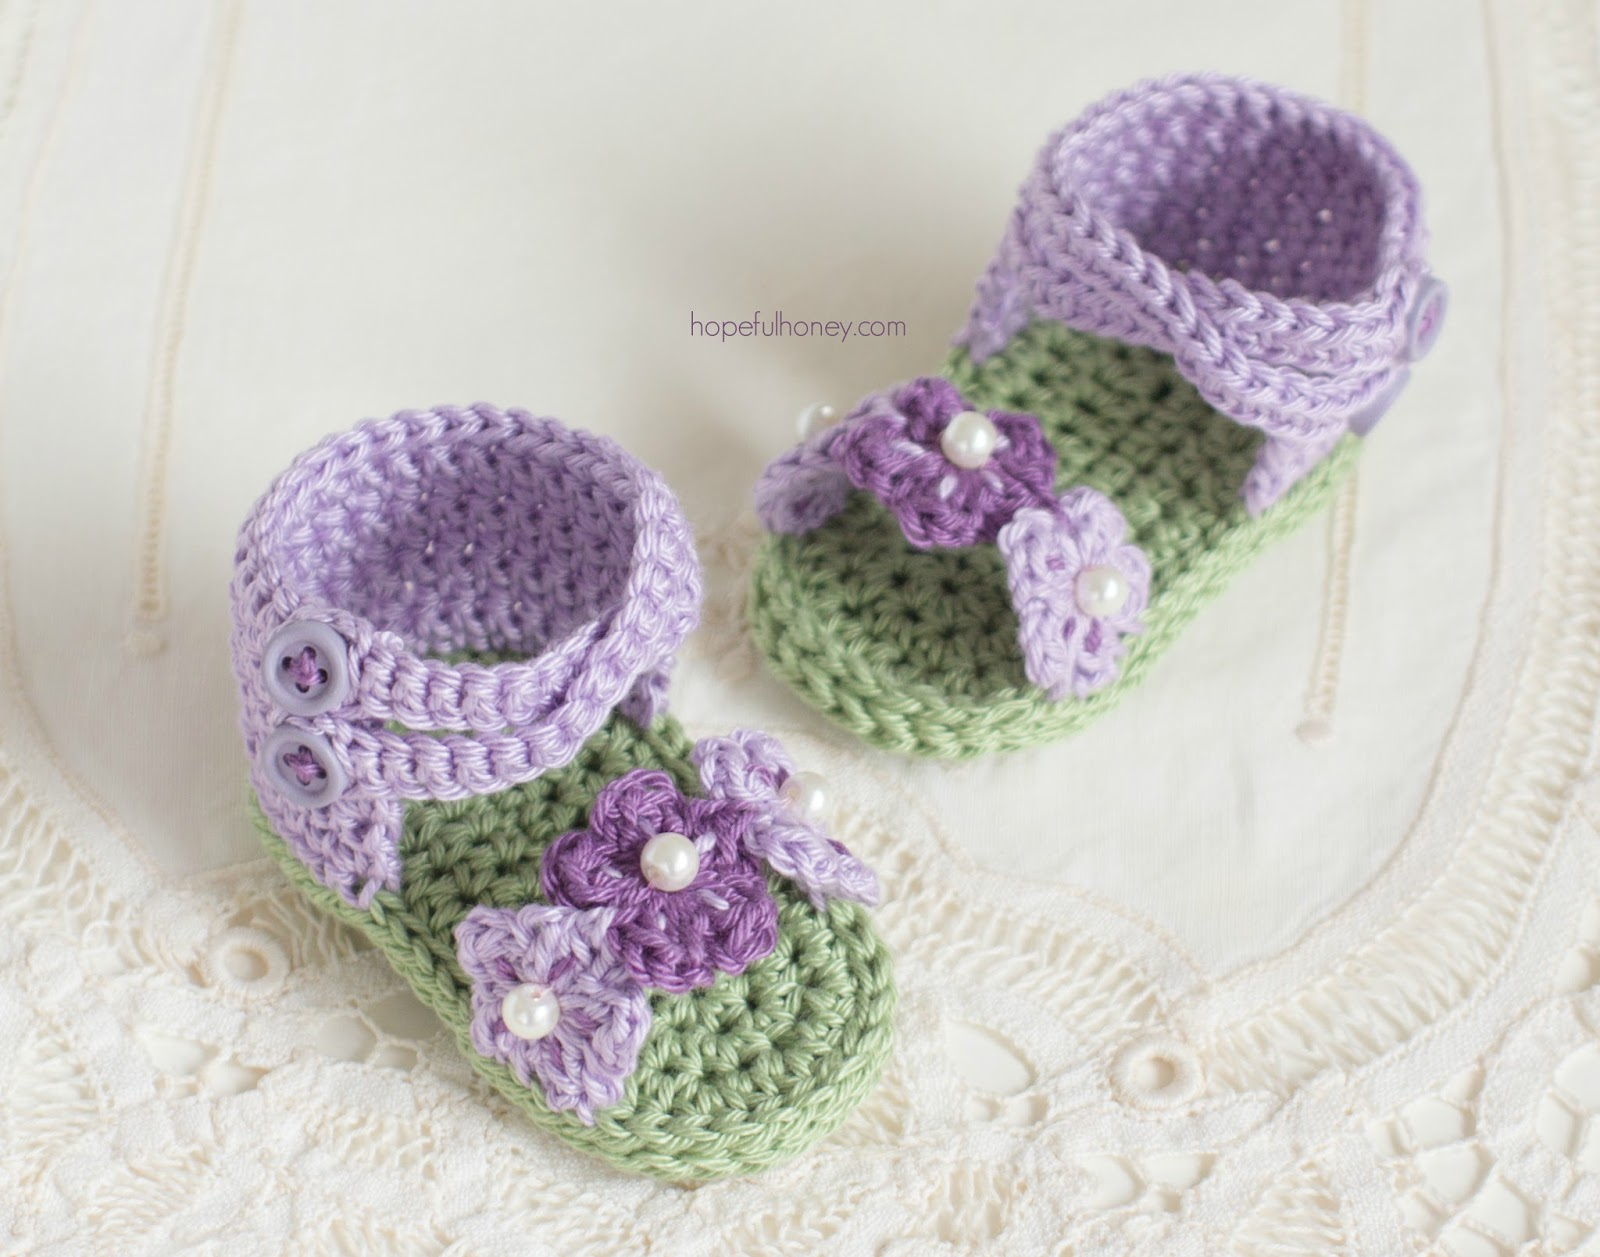 Free English Baby Crochet Patterns : Hopeful Honey Craft, Crochet, Create: English Violet ...